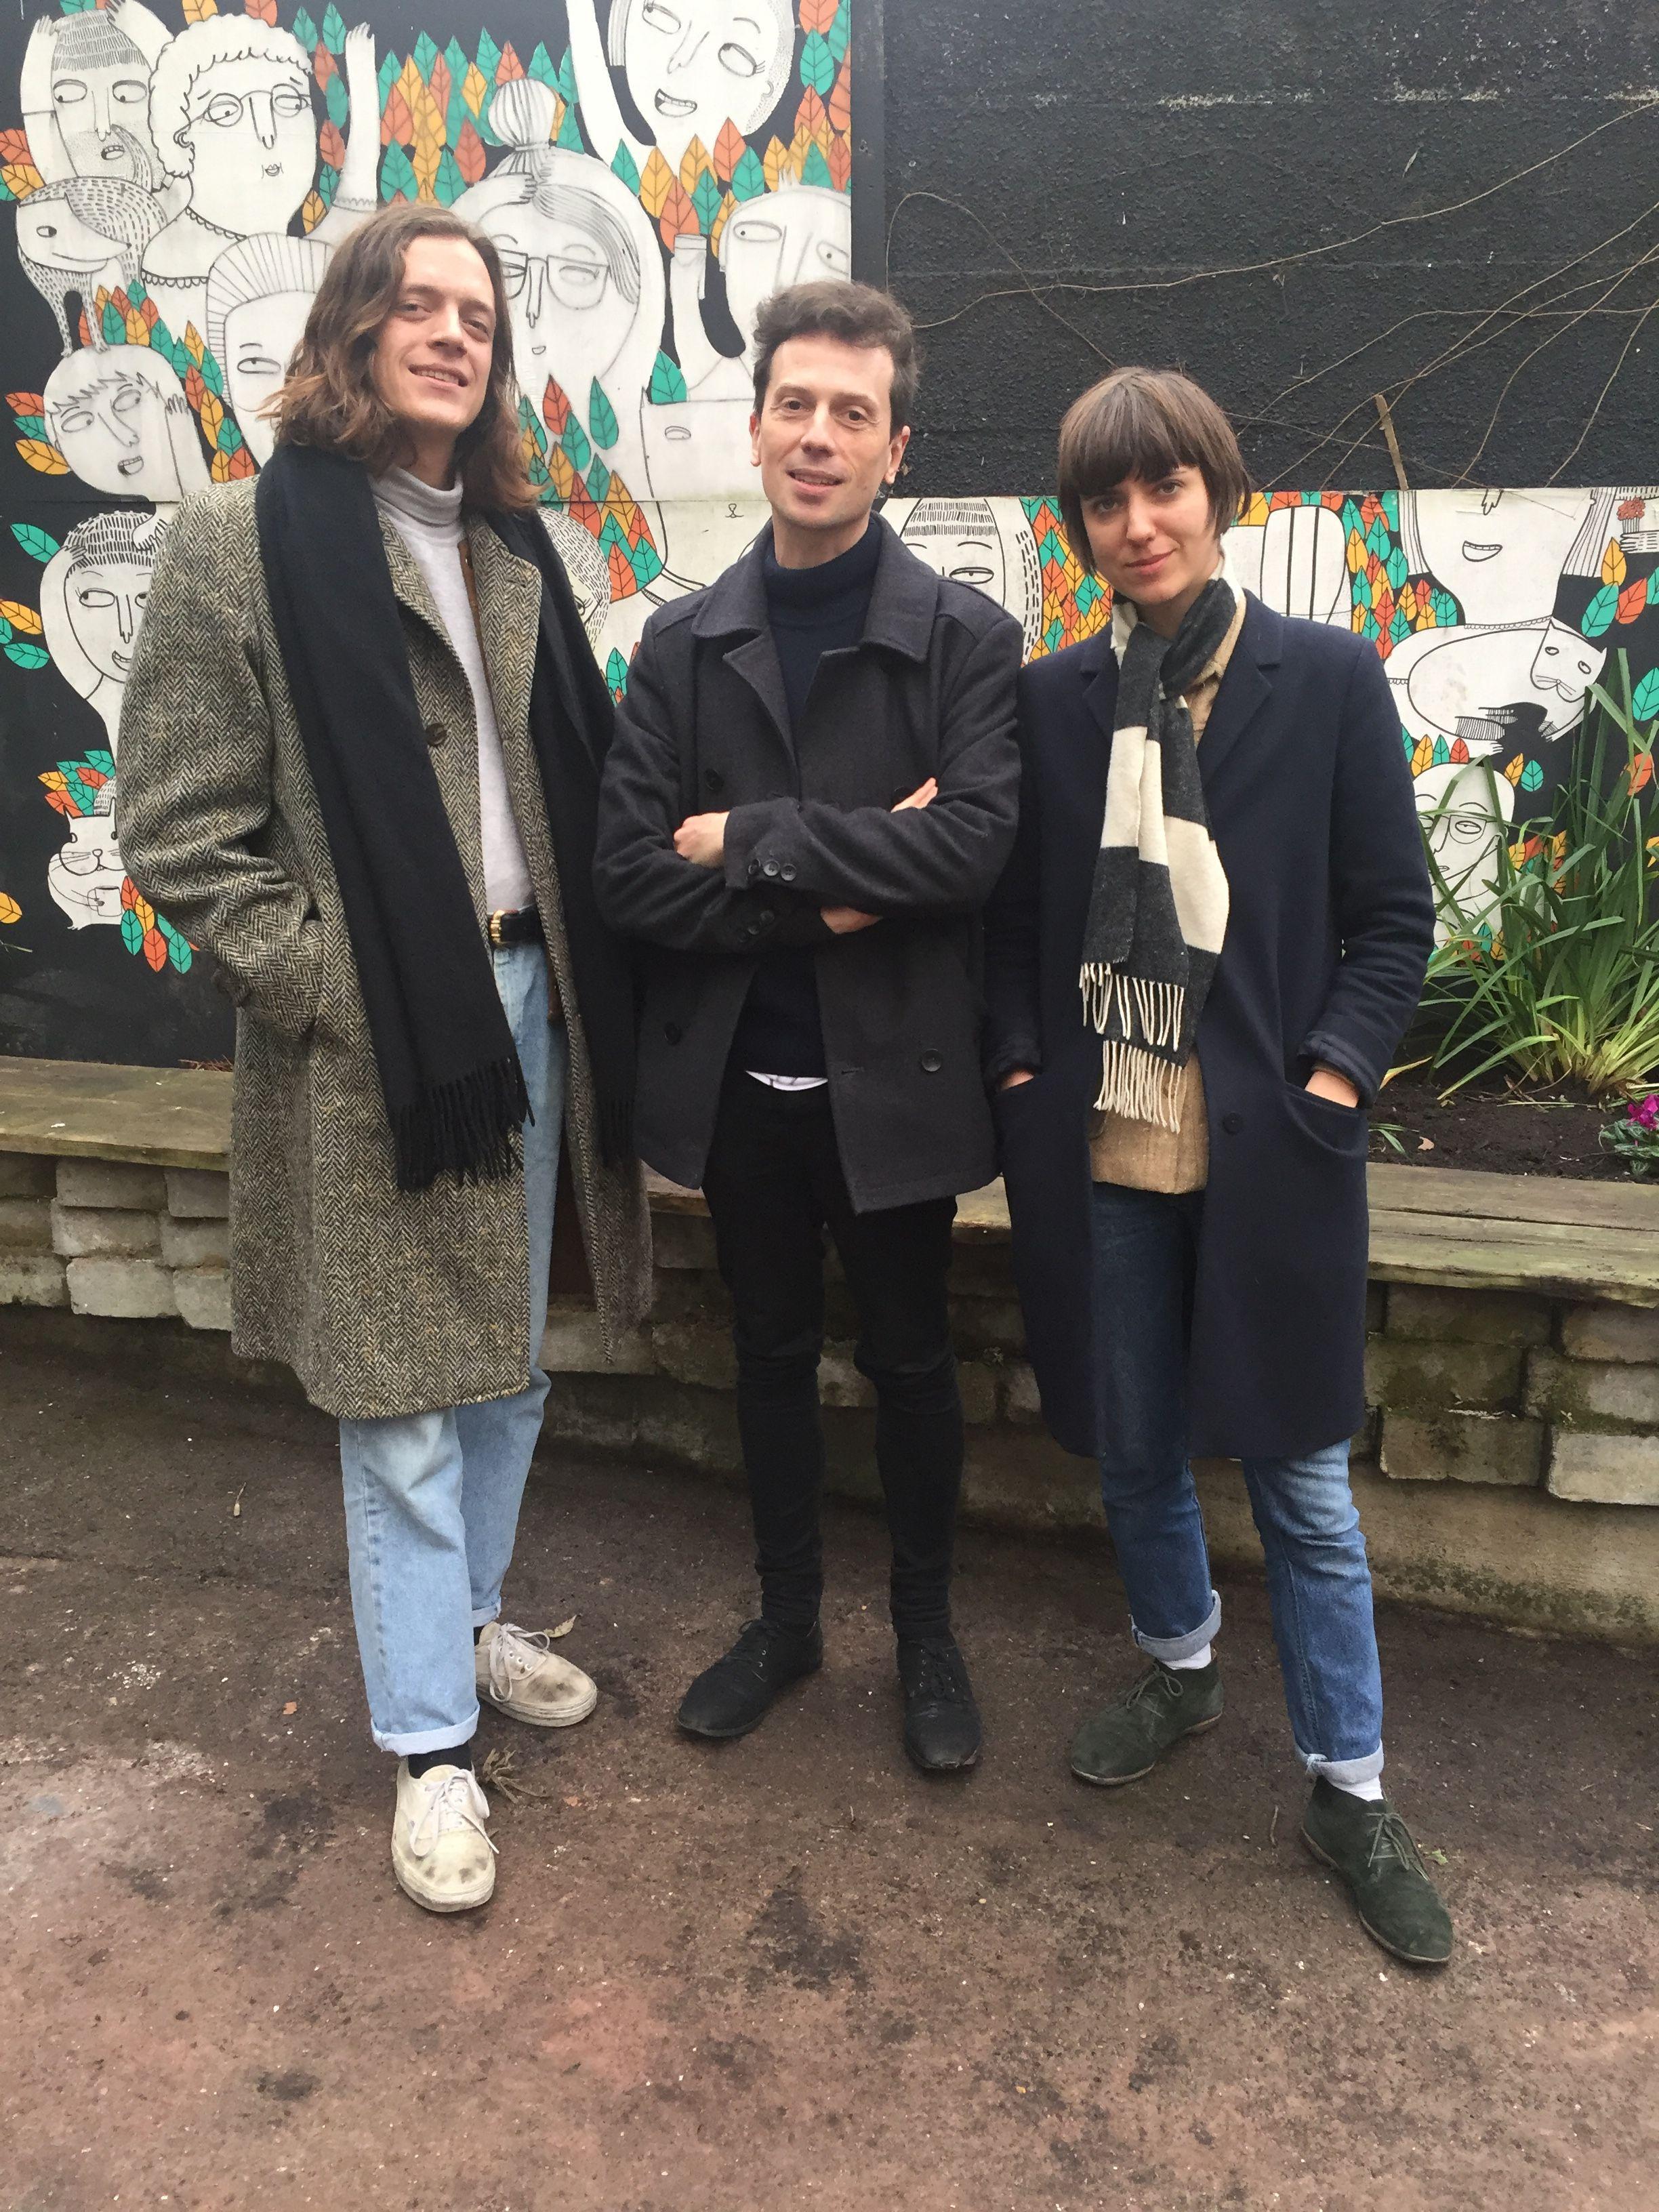 Hanford's Half Hour with Vanishing Twin + Low Island - Hoxton Radio